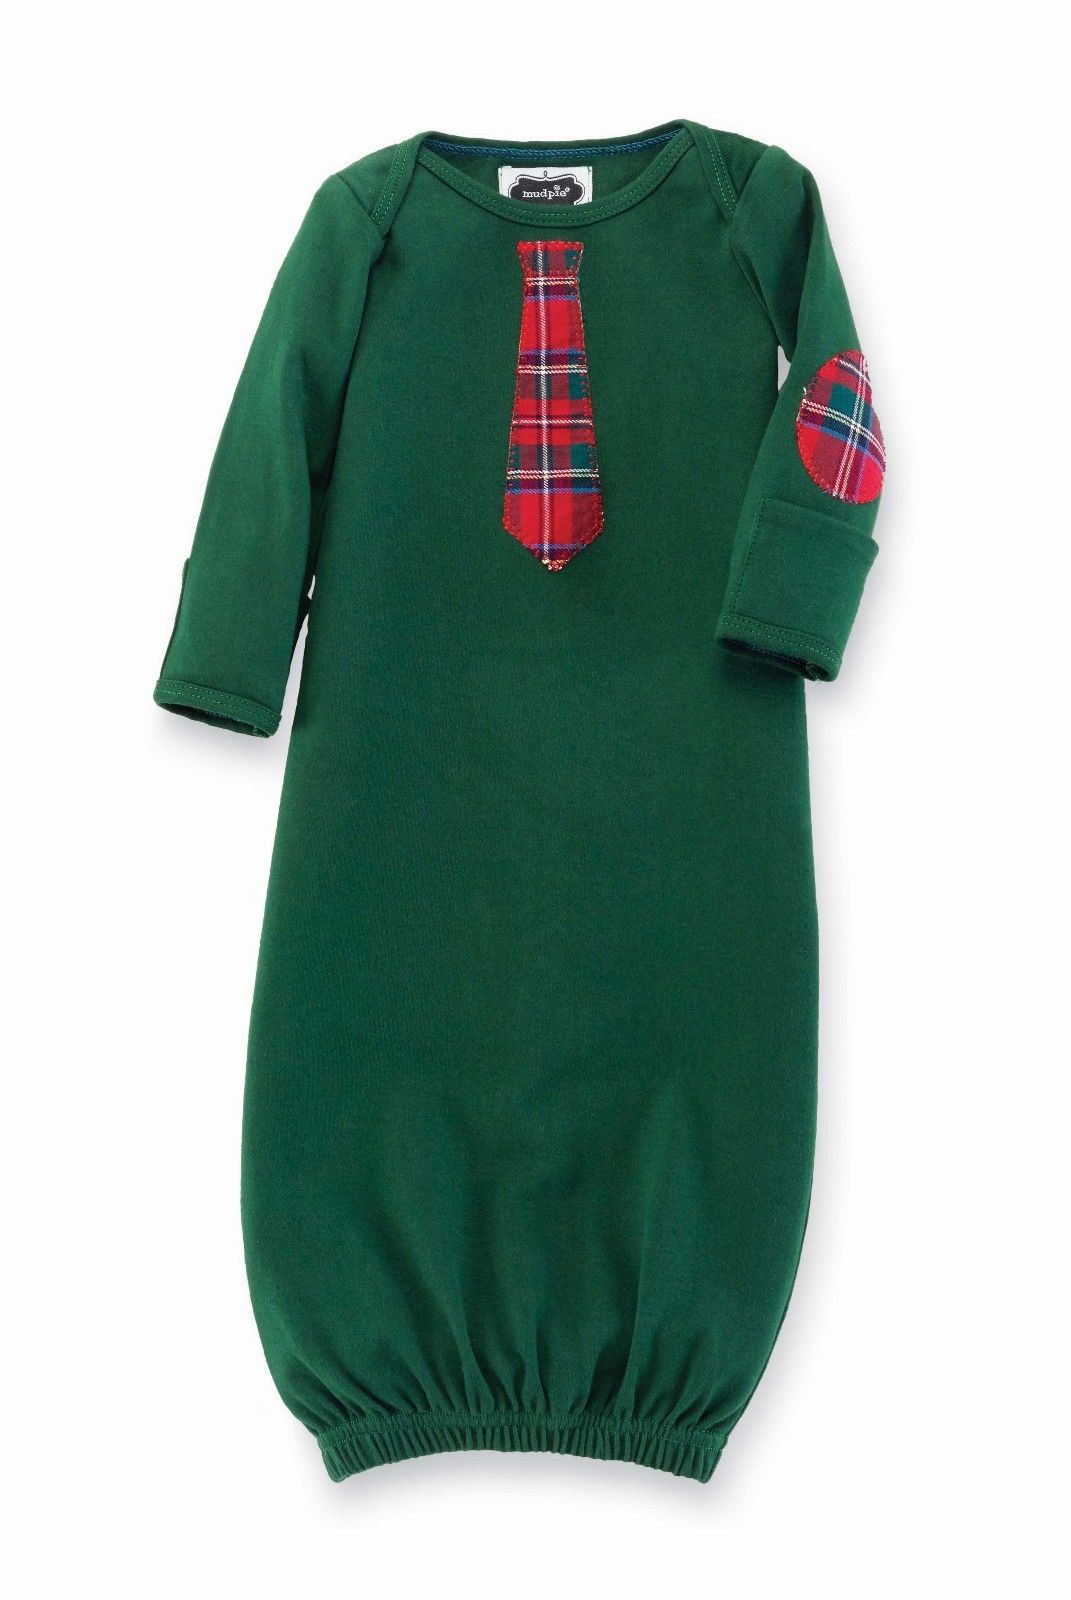 Baby Boy Christmas Plaid Shirt Kuenzi Turf Amp Nursery